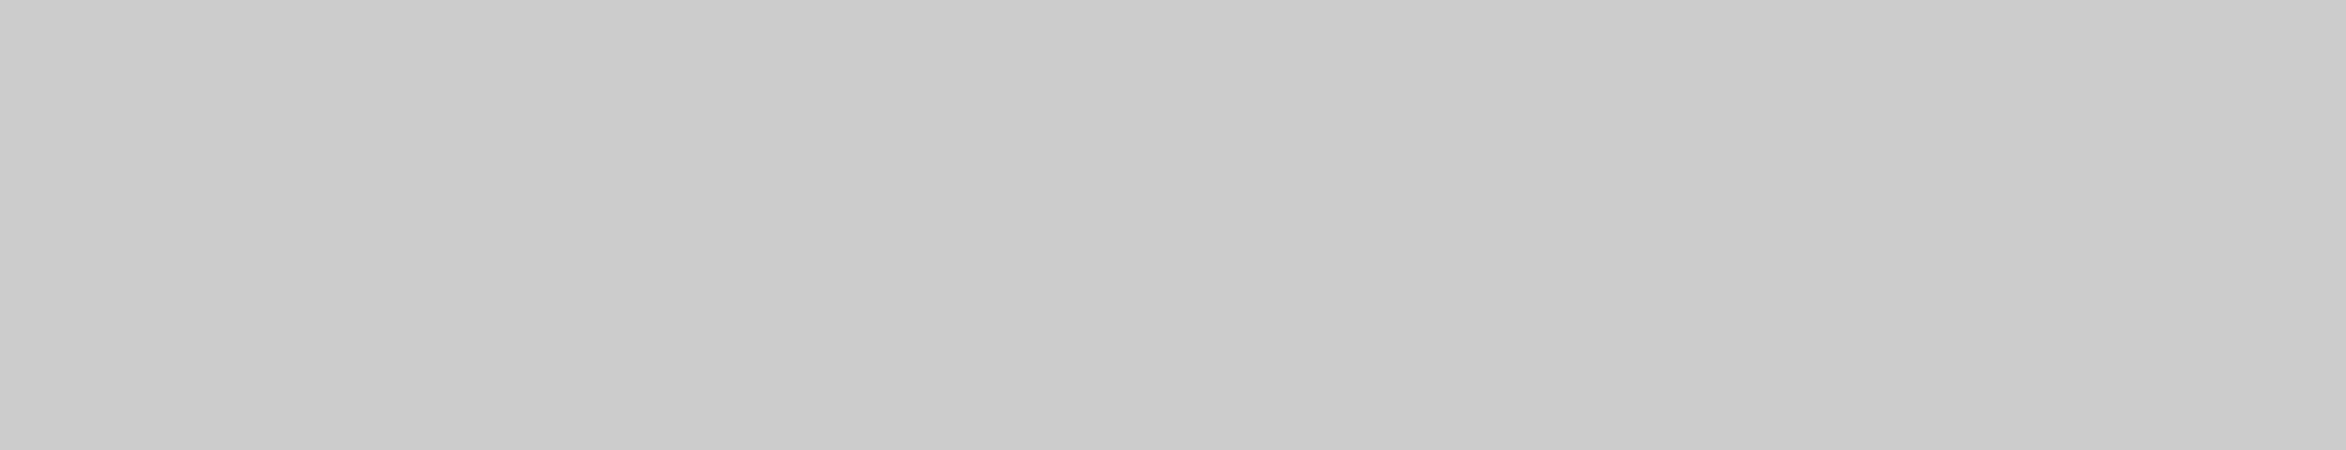 OLIVELA client logo